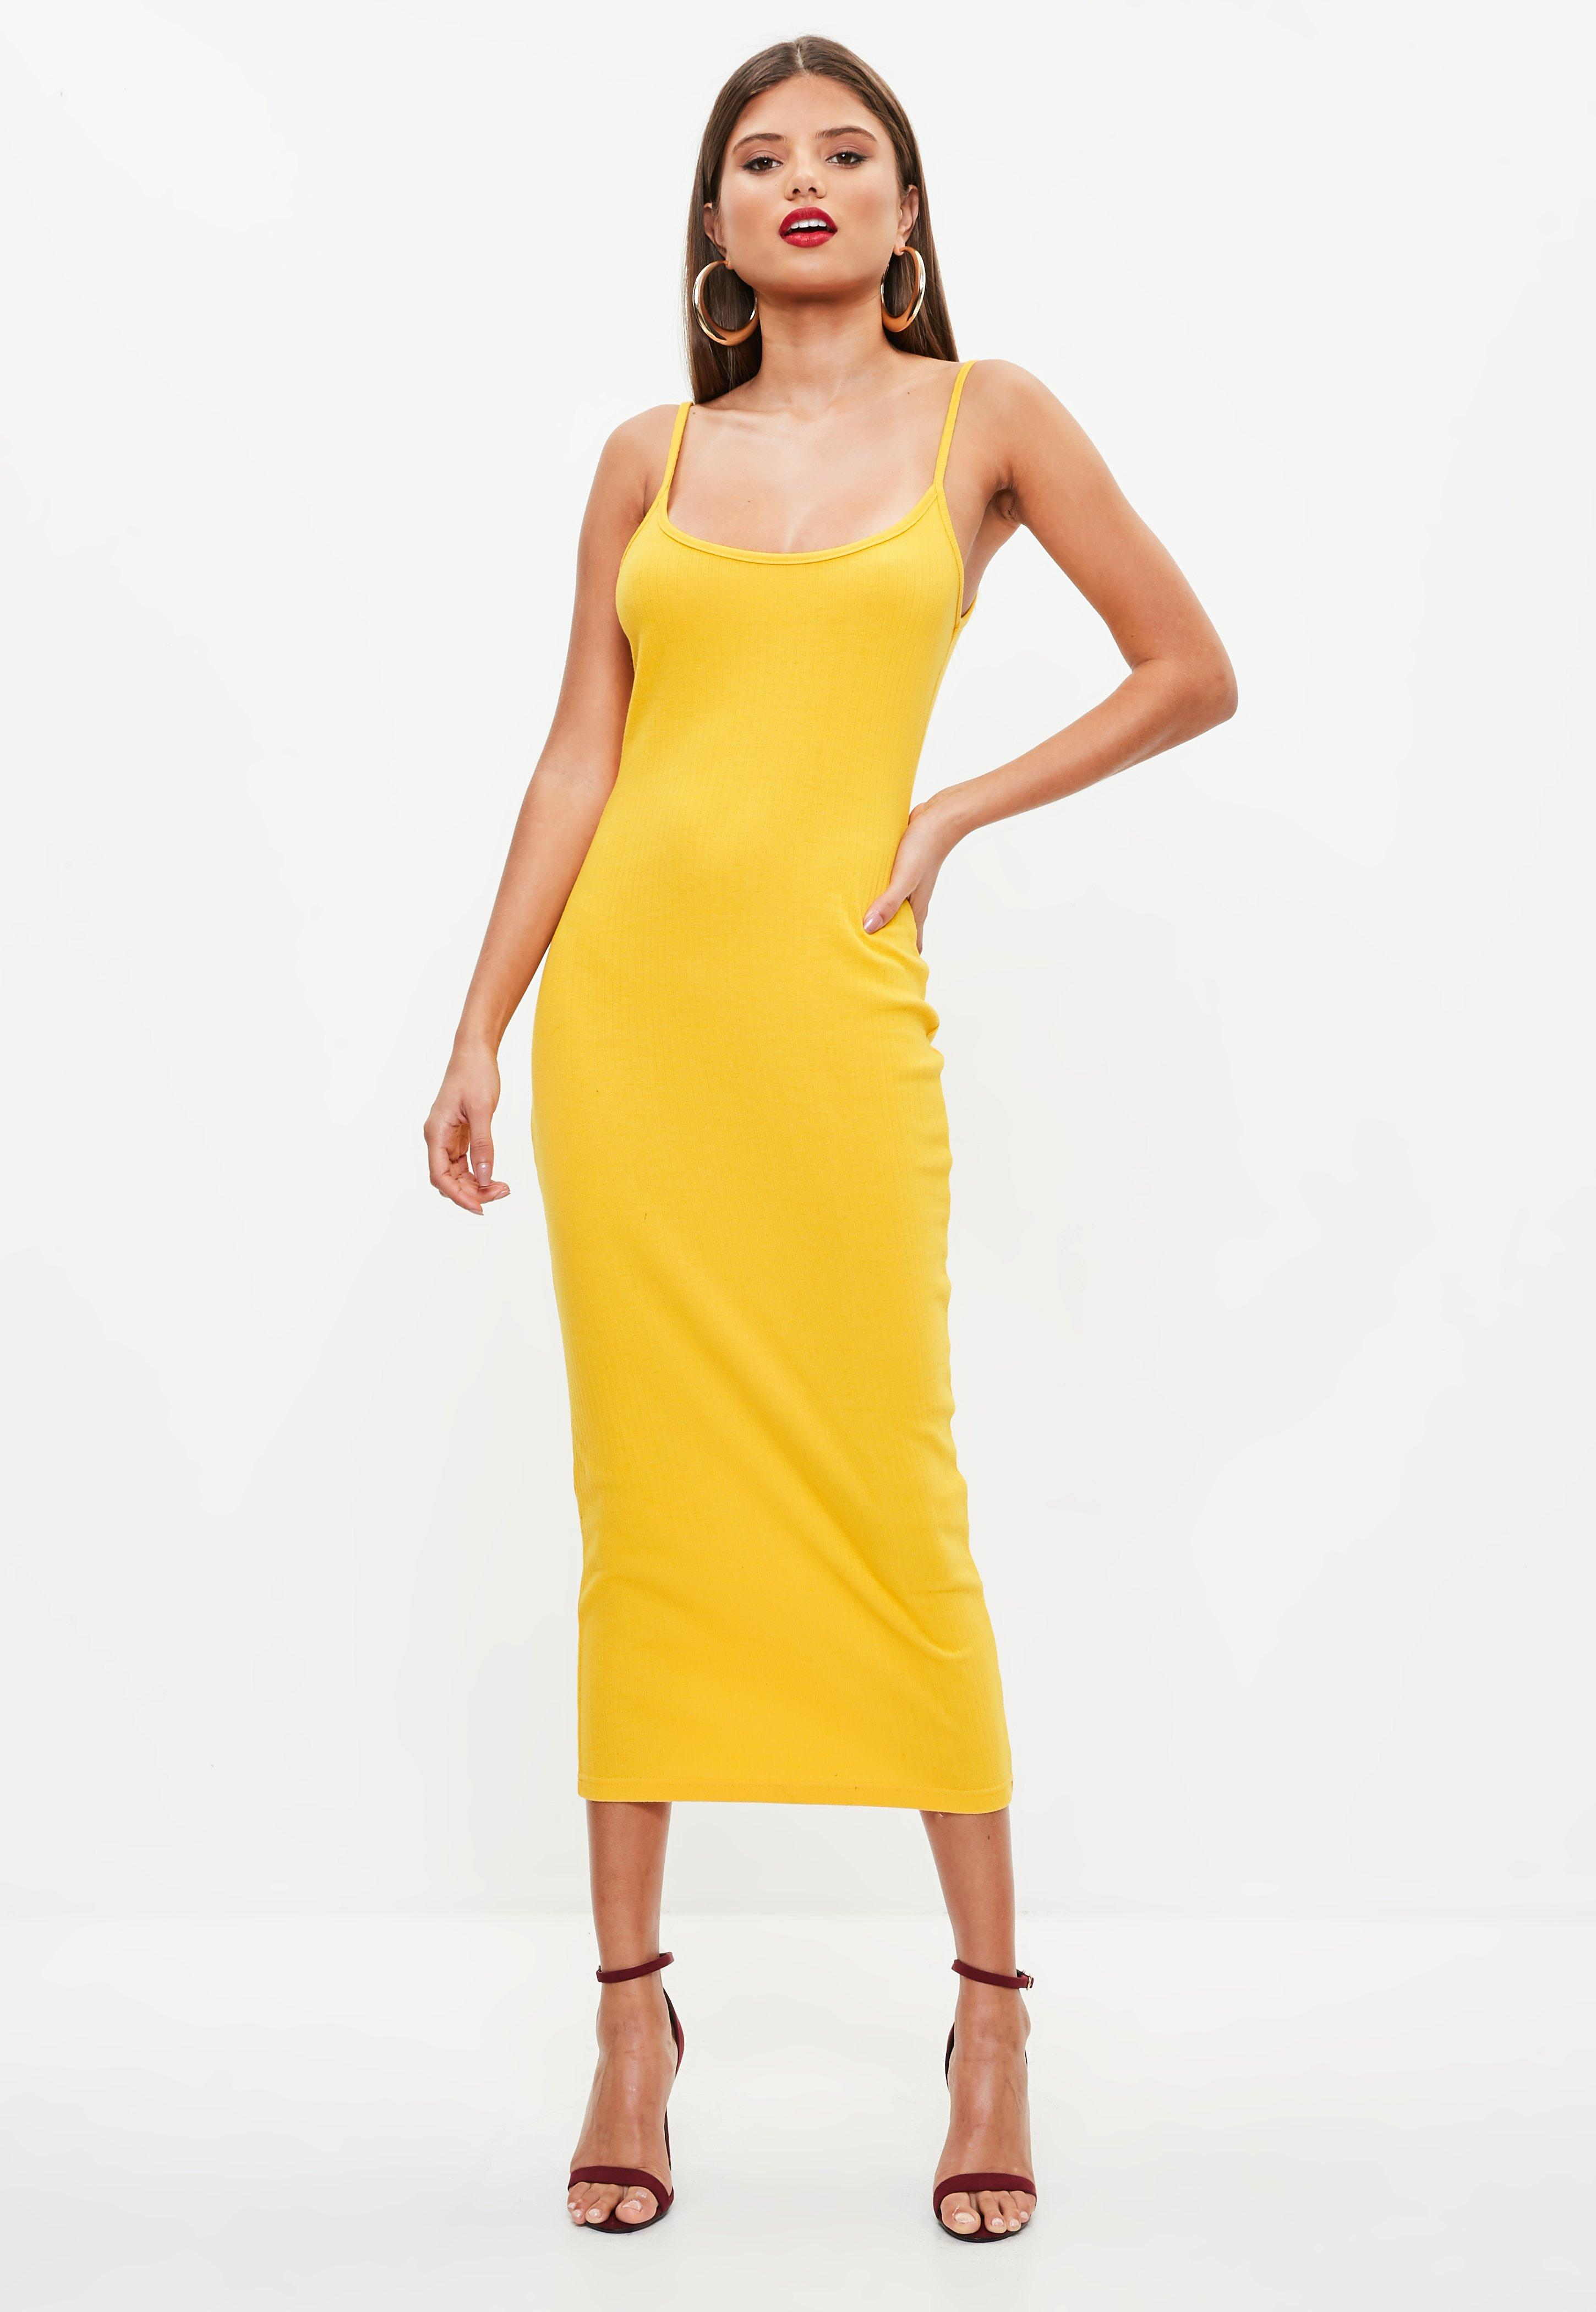 Jenifer bartoli en robe jaune